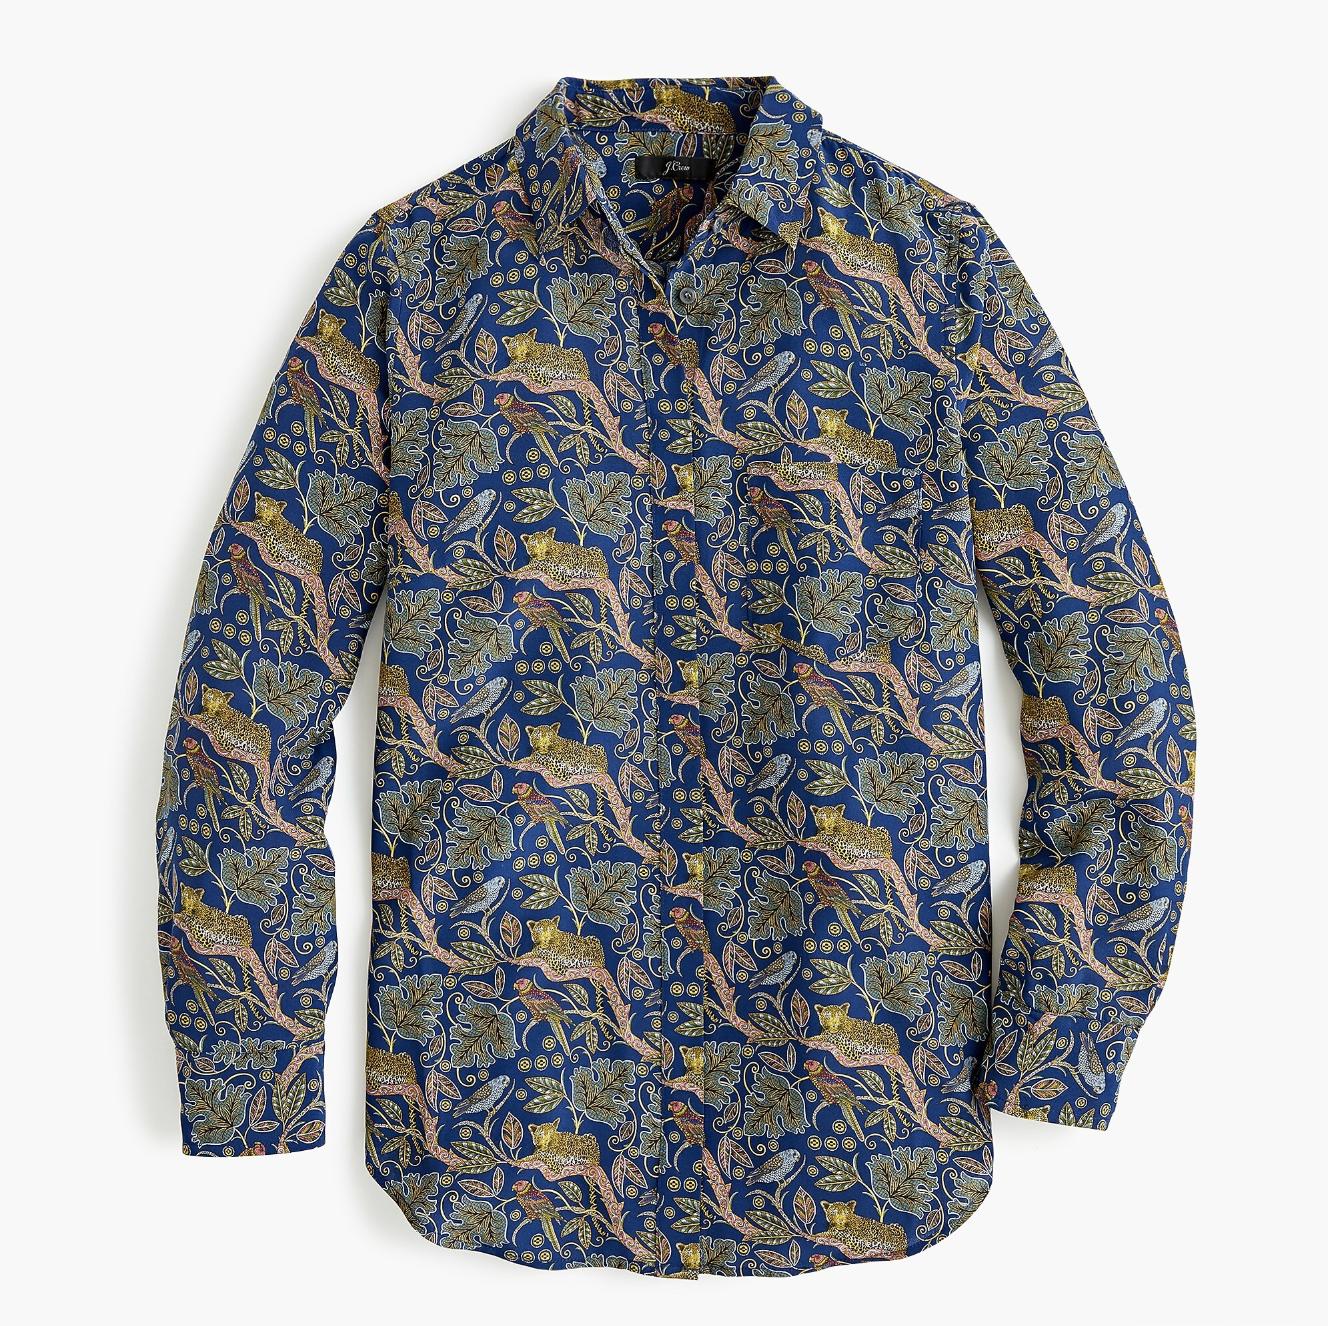 J.Crew Collection Leopard Silk Blouse